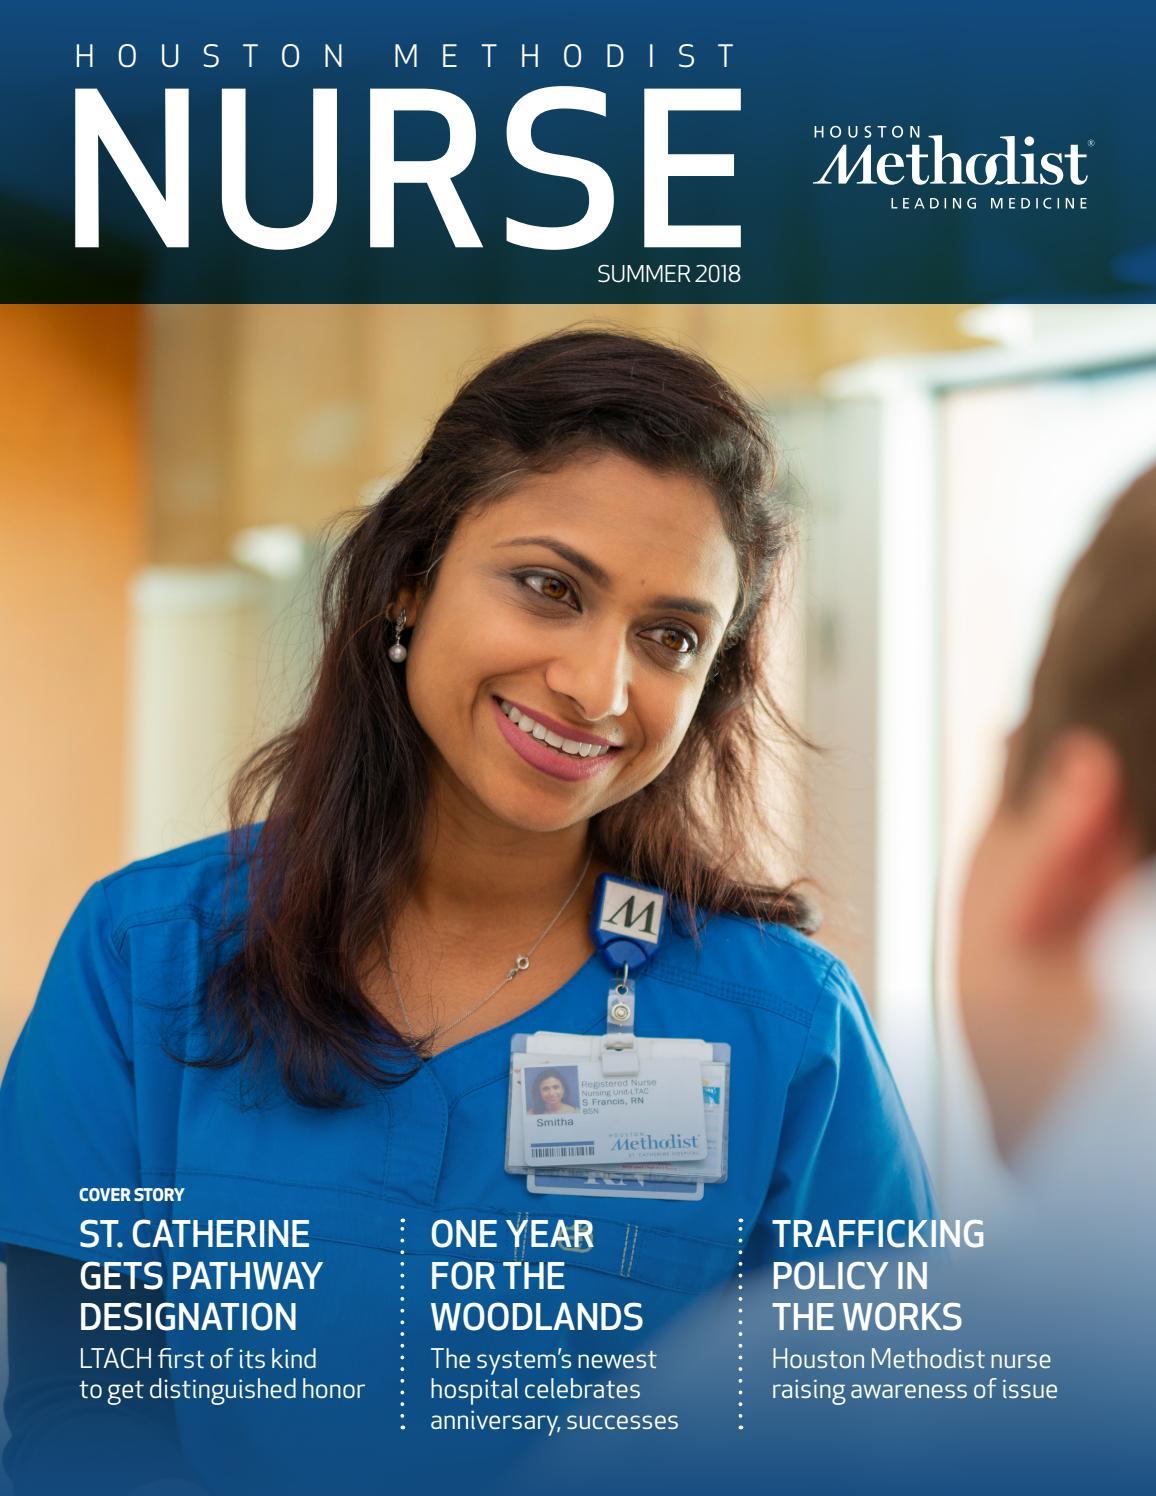 Houston Methodist Nurse Magazine - Summer 2018 by Houston